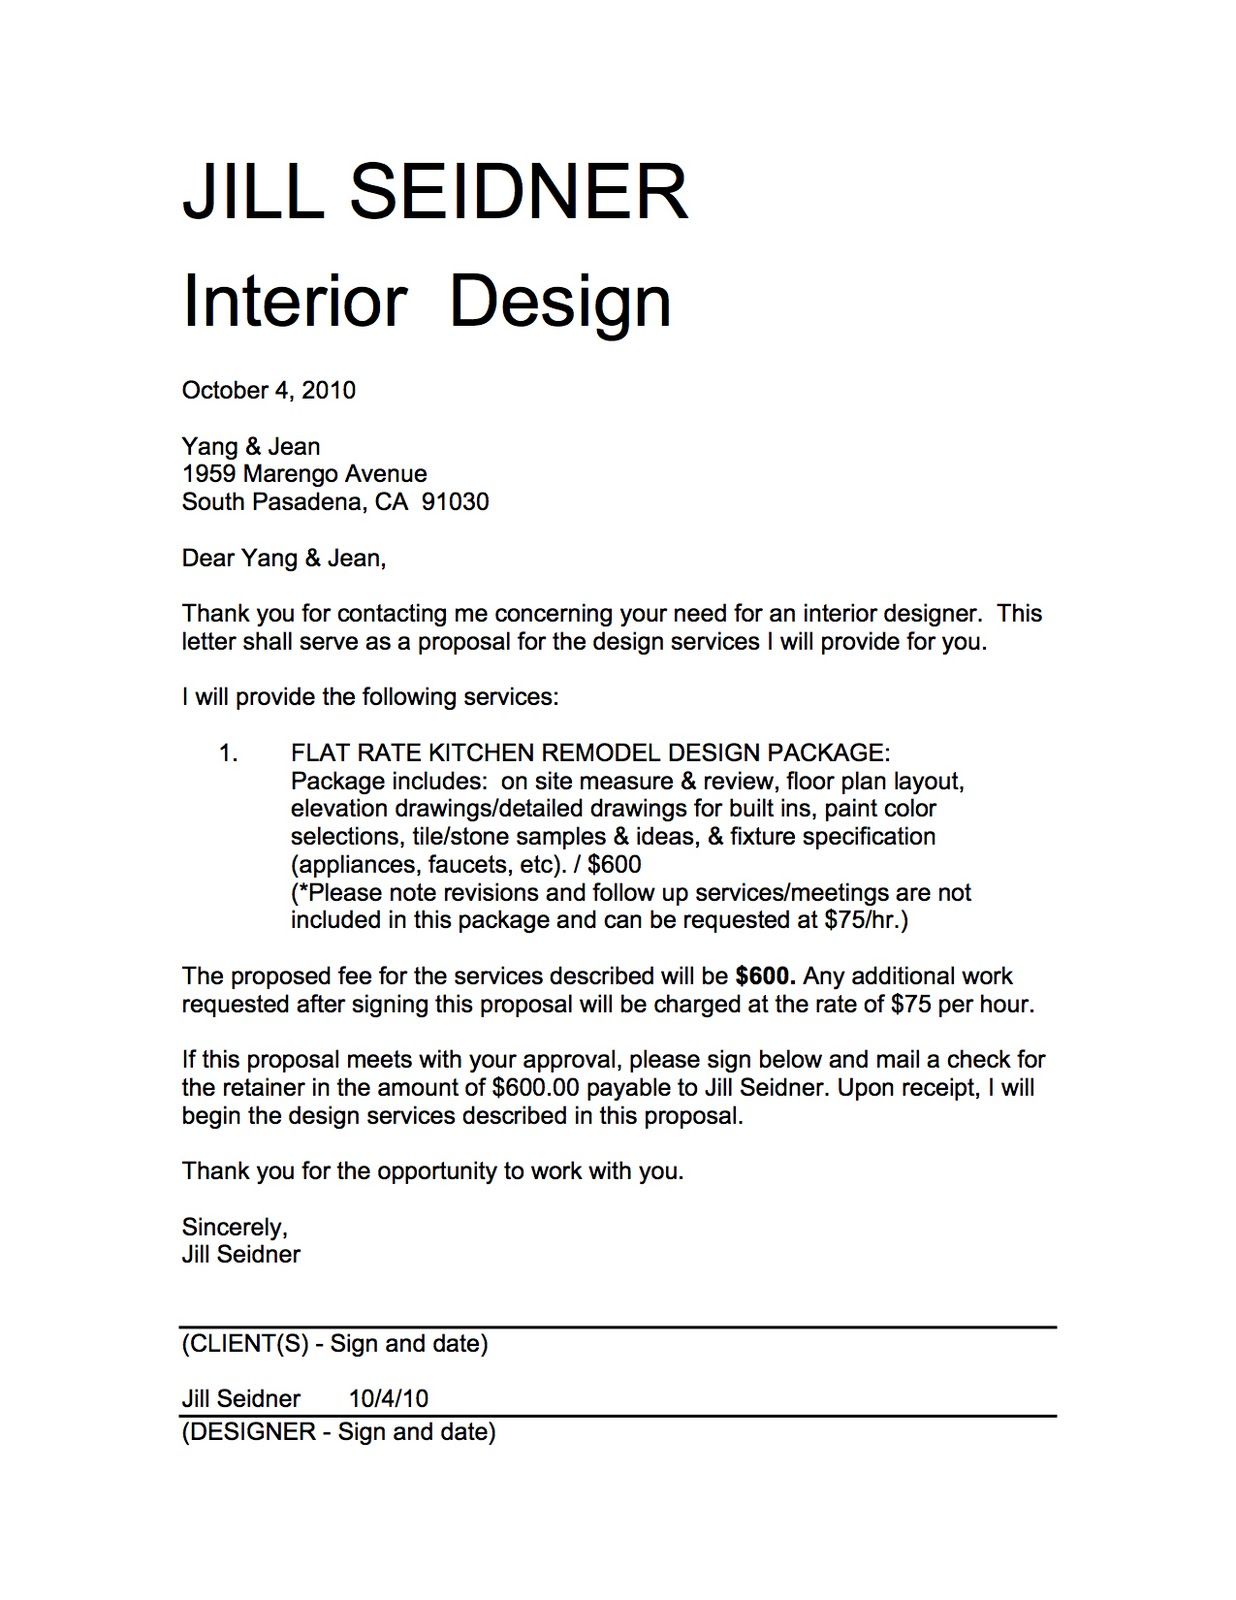 Interior Design check your essay free